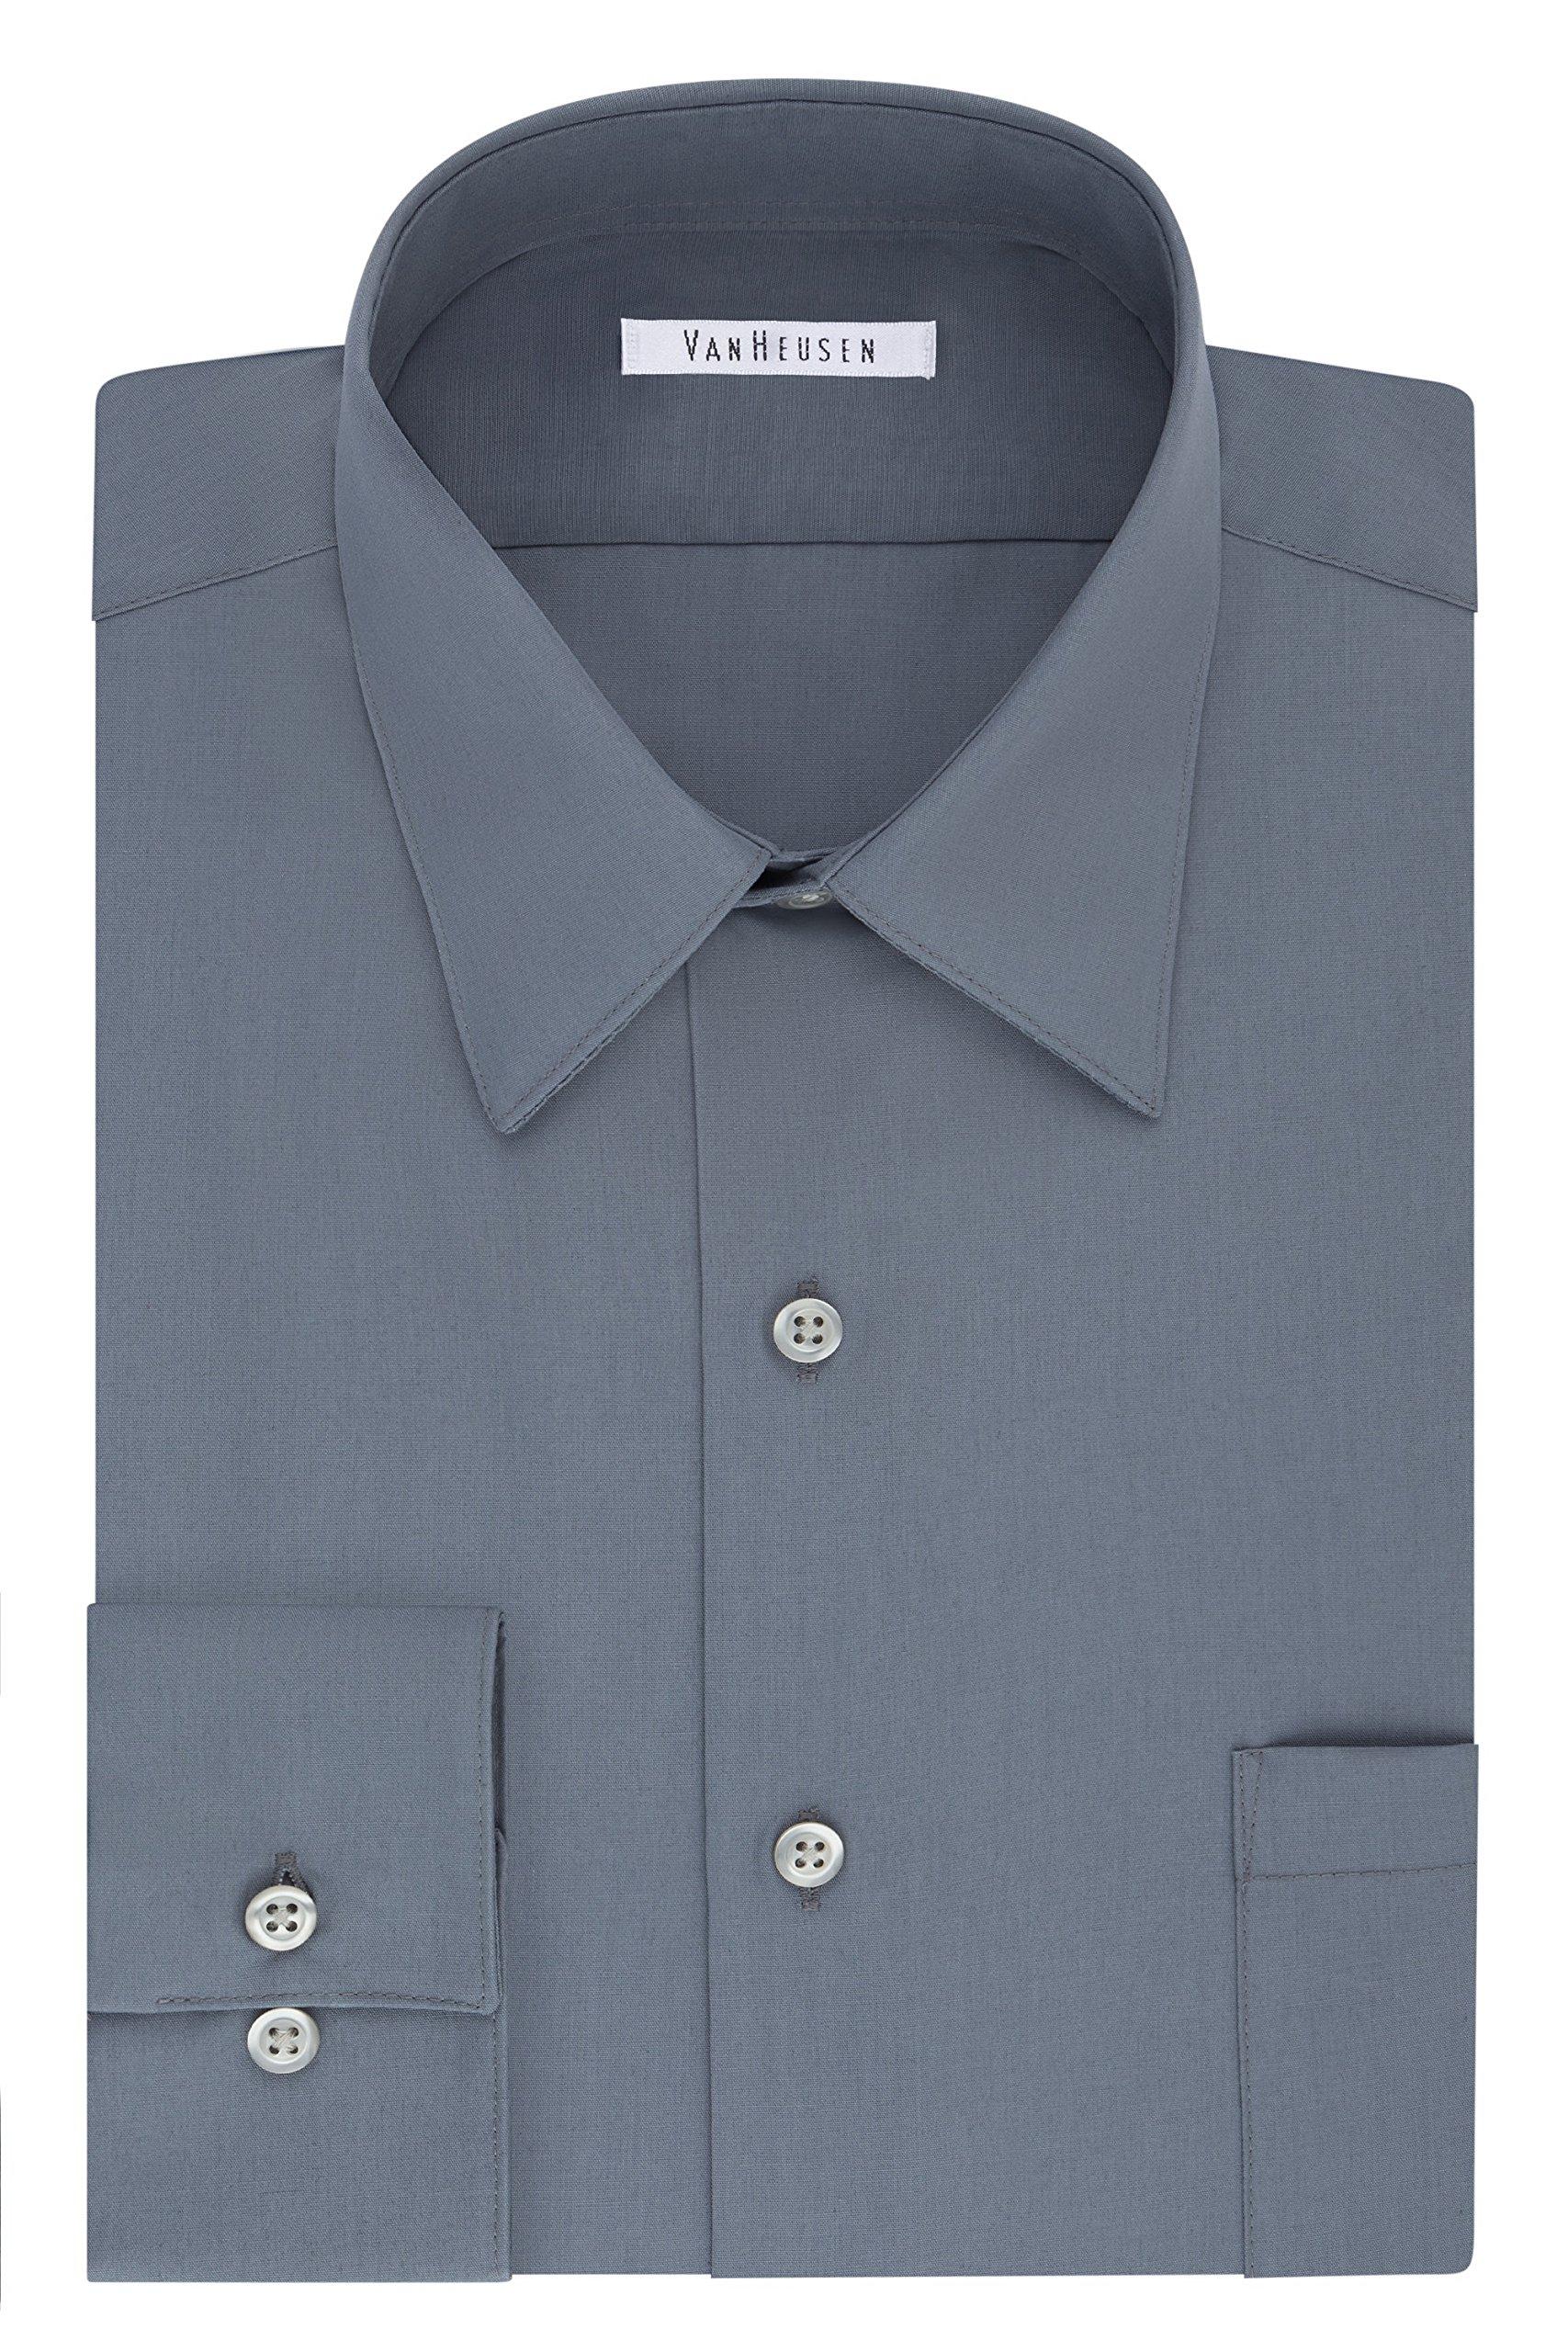 Van Heusen Men's Size Big Dress Shirt Tall Fit Poplin, Grey, 22'' Neck 35''-36'' Sleeve